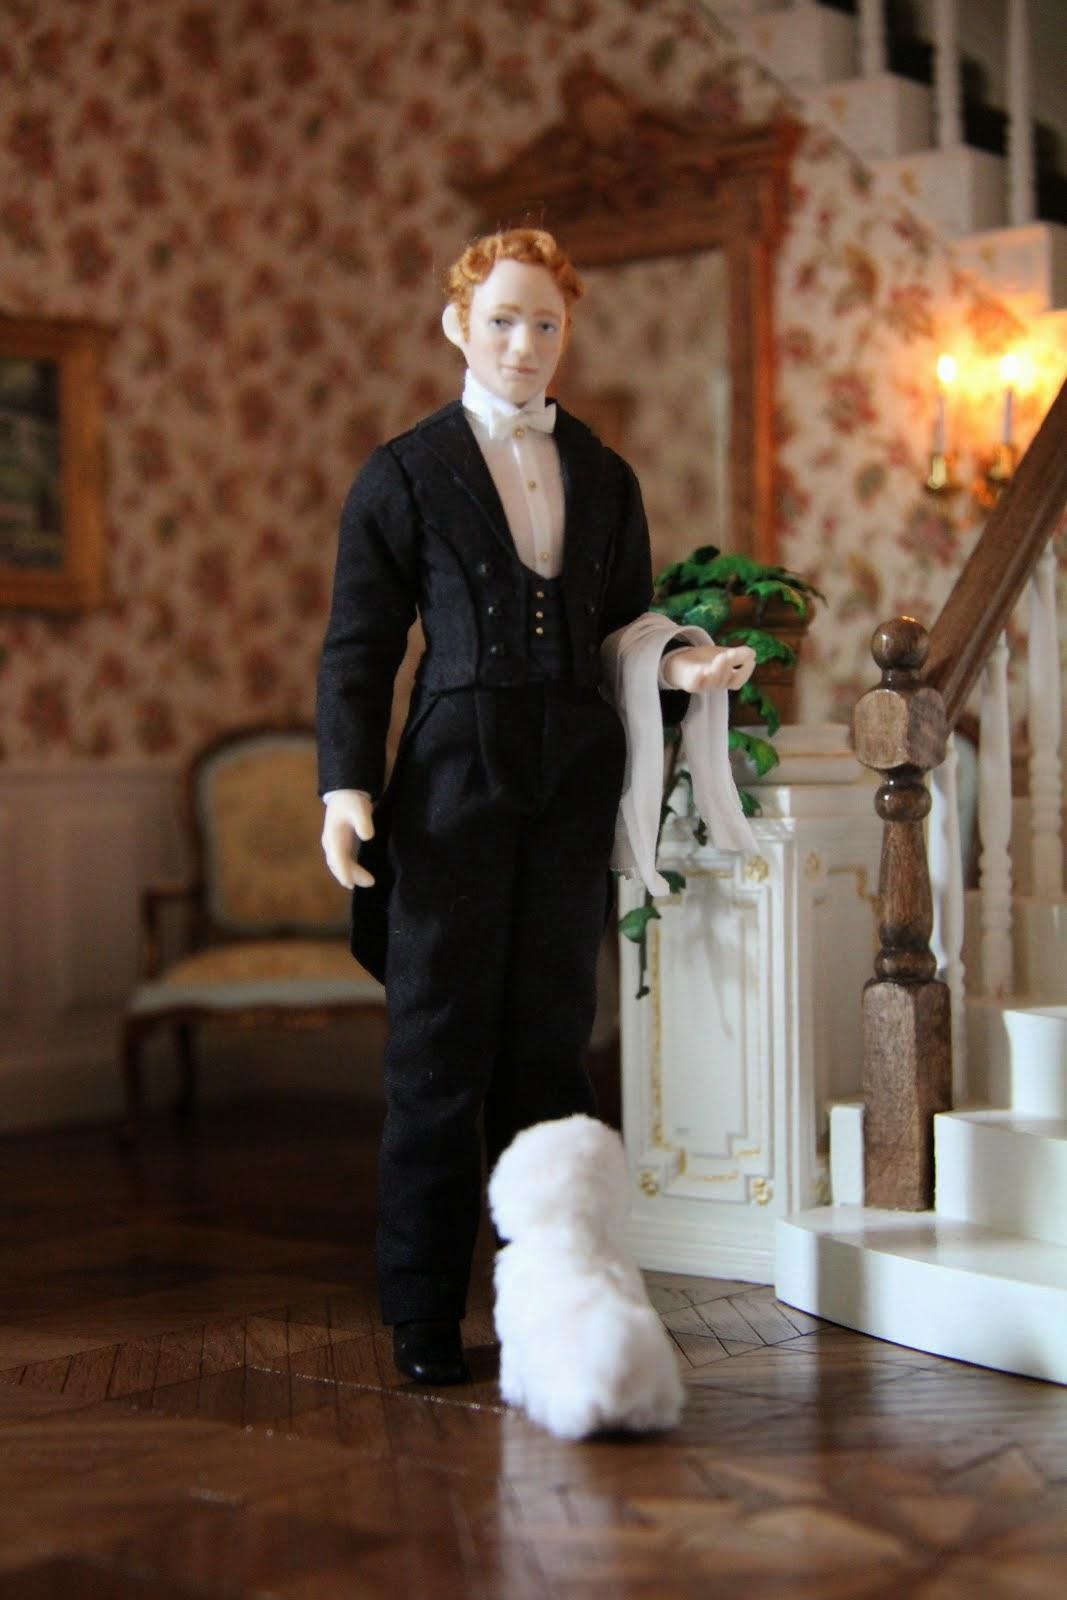 Butler Herr Adam